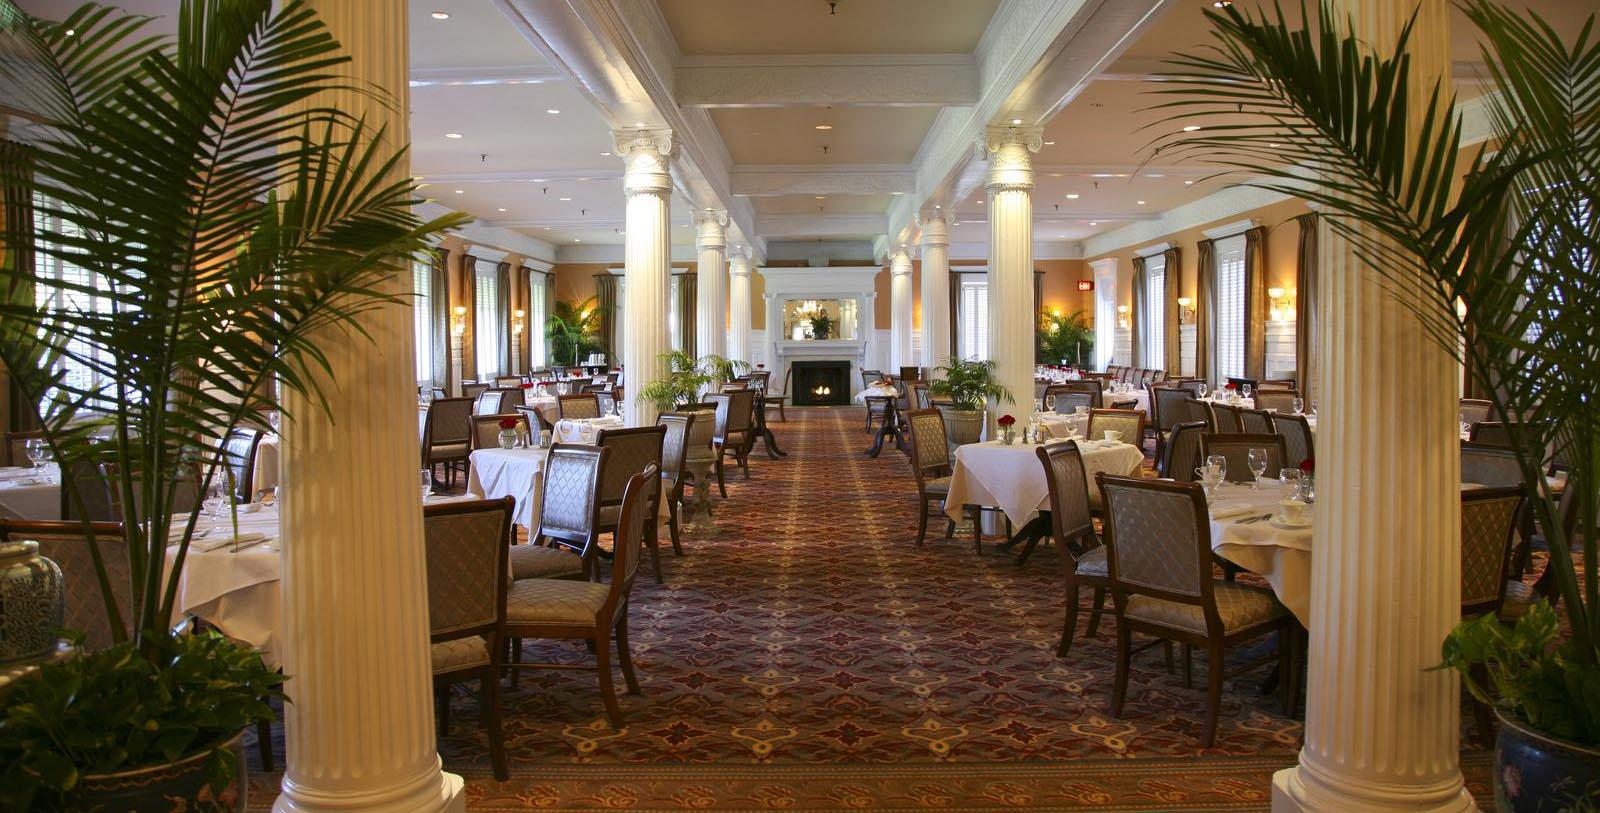 Image of the Grand Dining Room of the Jekyll Island Club Resort on Jekyll Island, Georgia